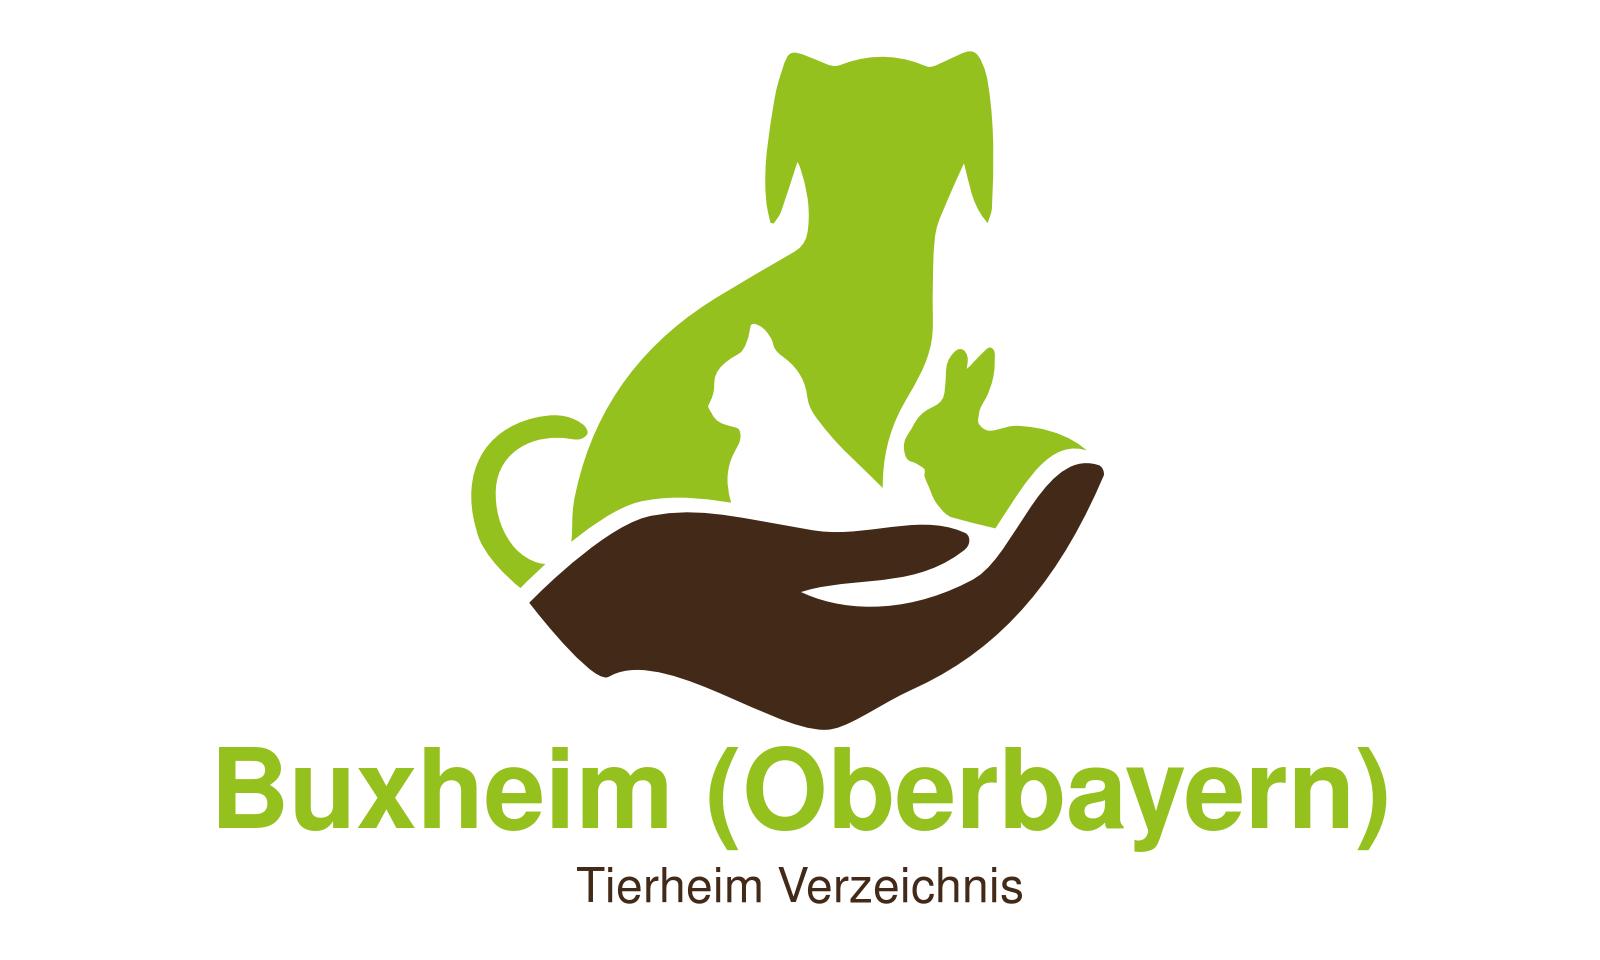 Tierheim Buxheim (Oberbayern)